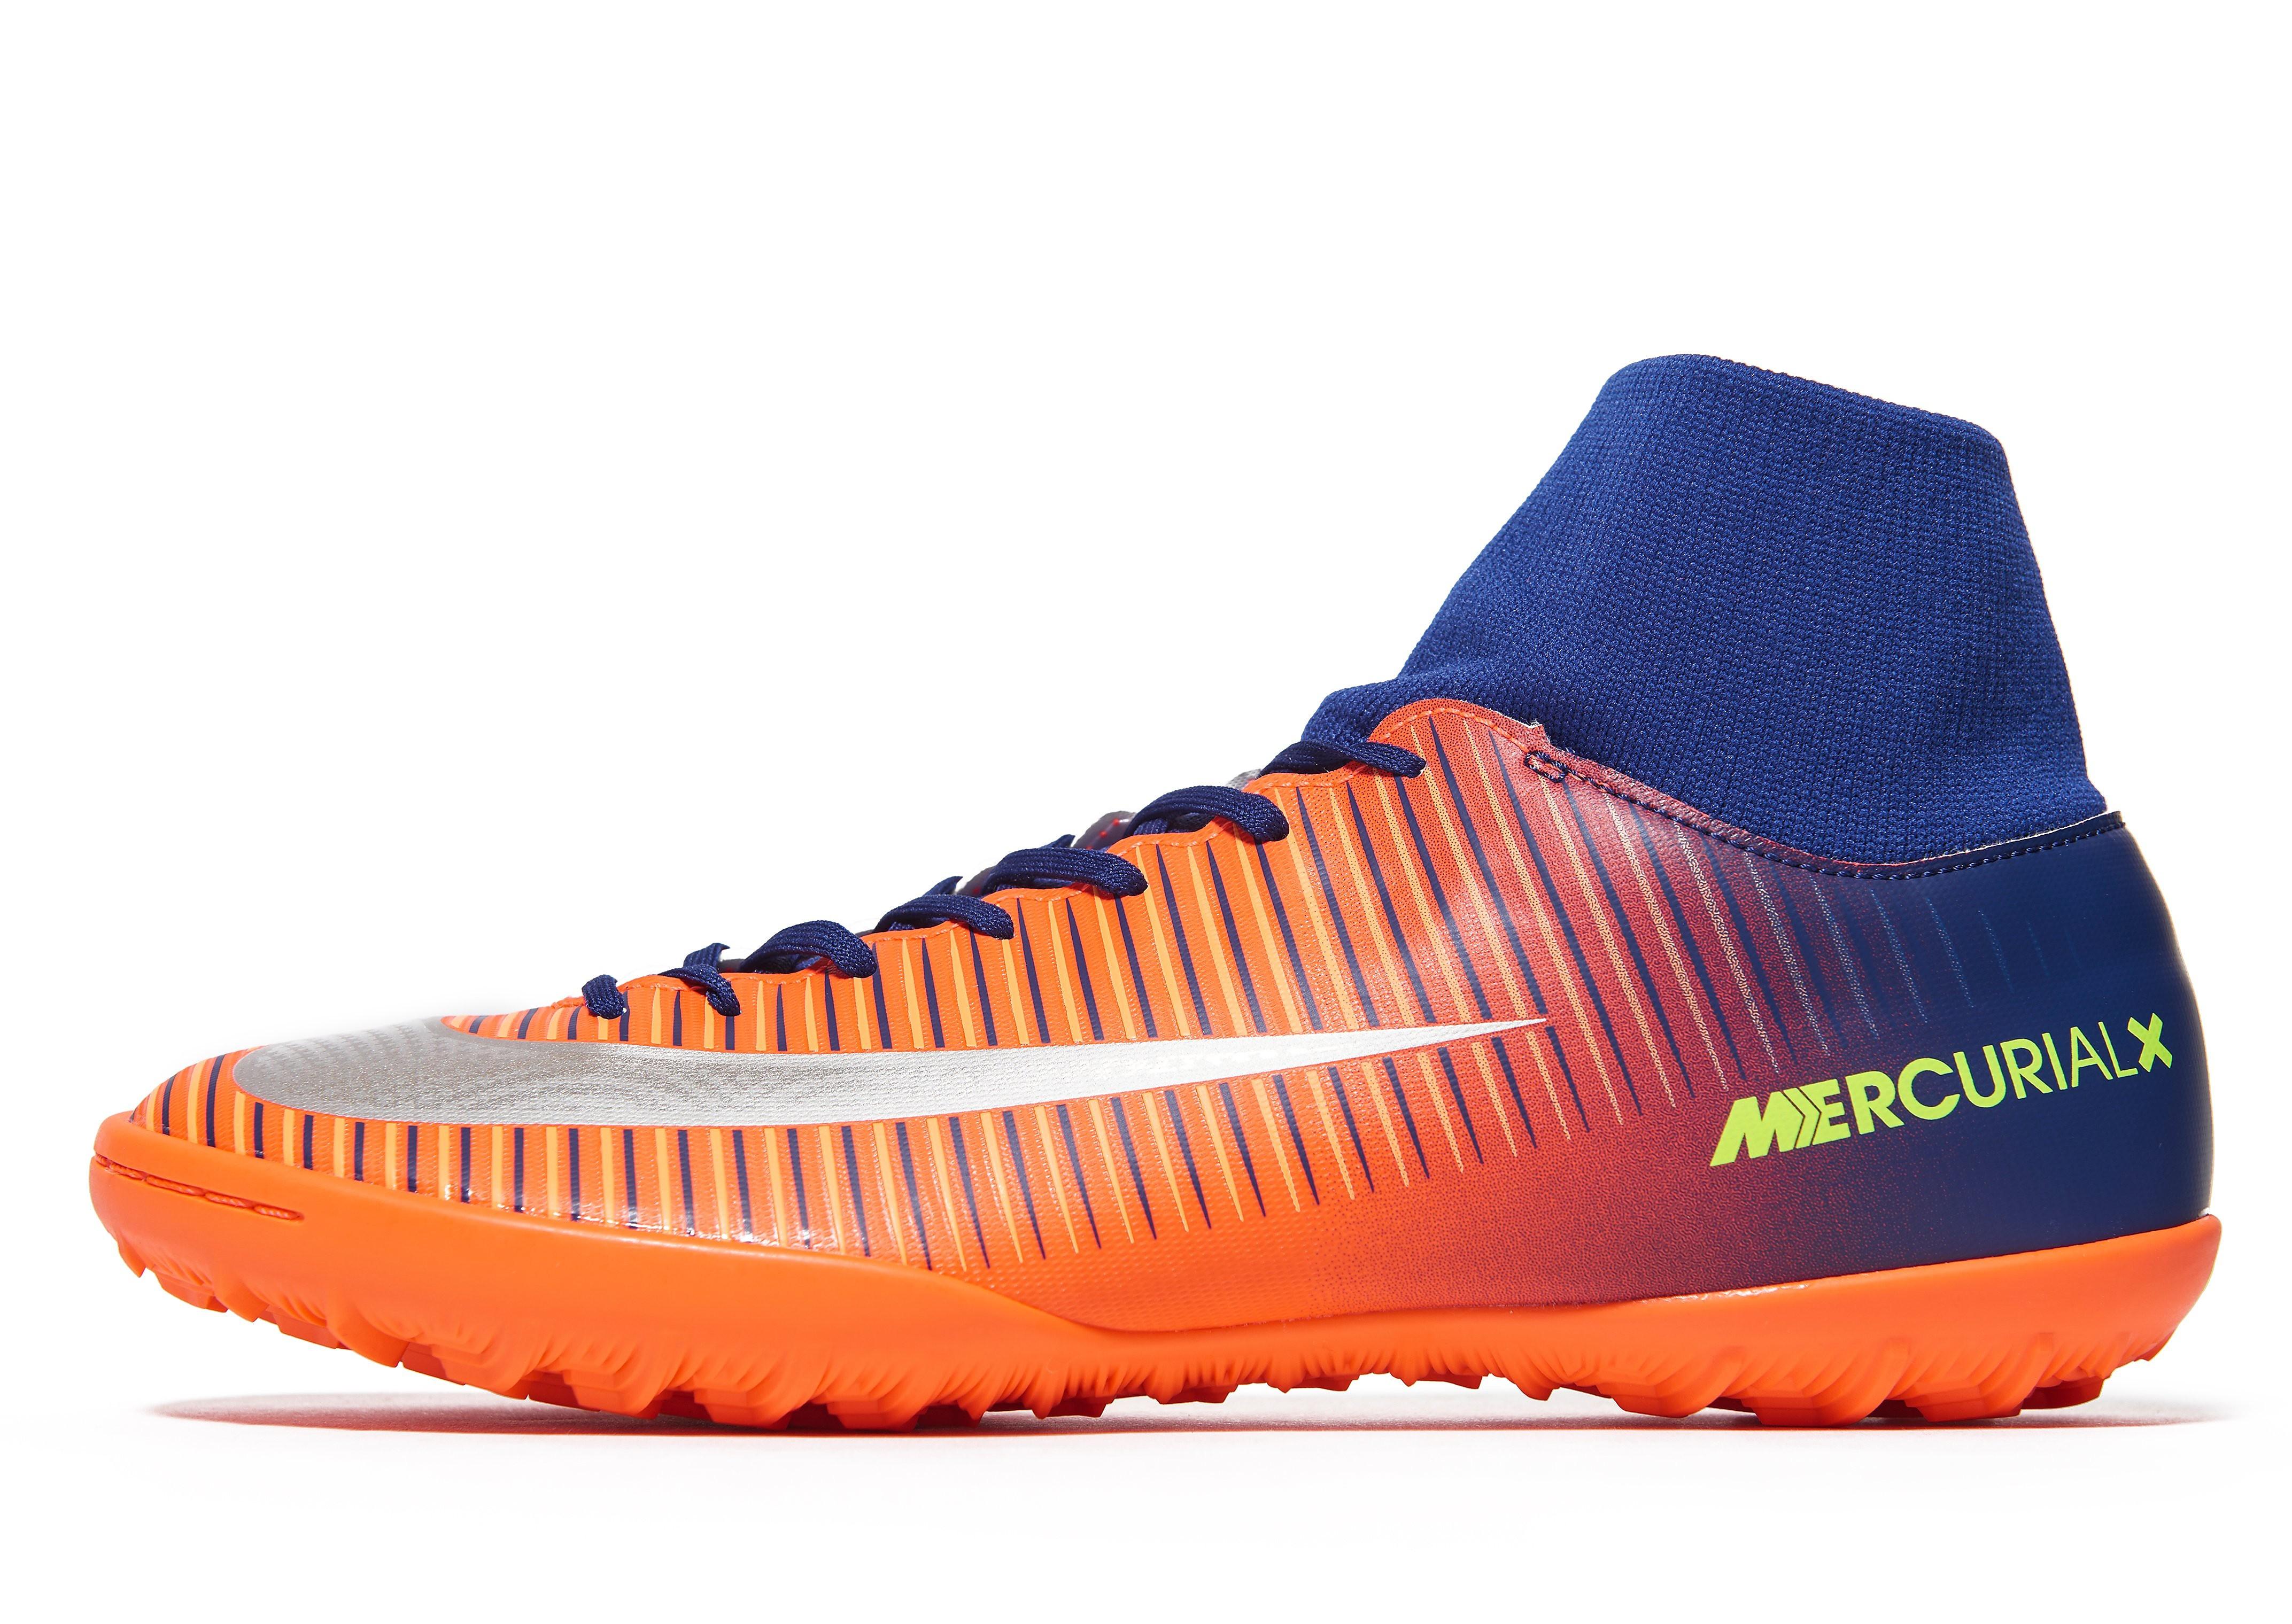 Nike Time To Shine Mercurial Victory DF VI Turf